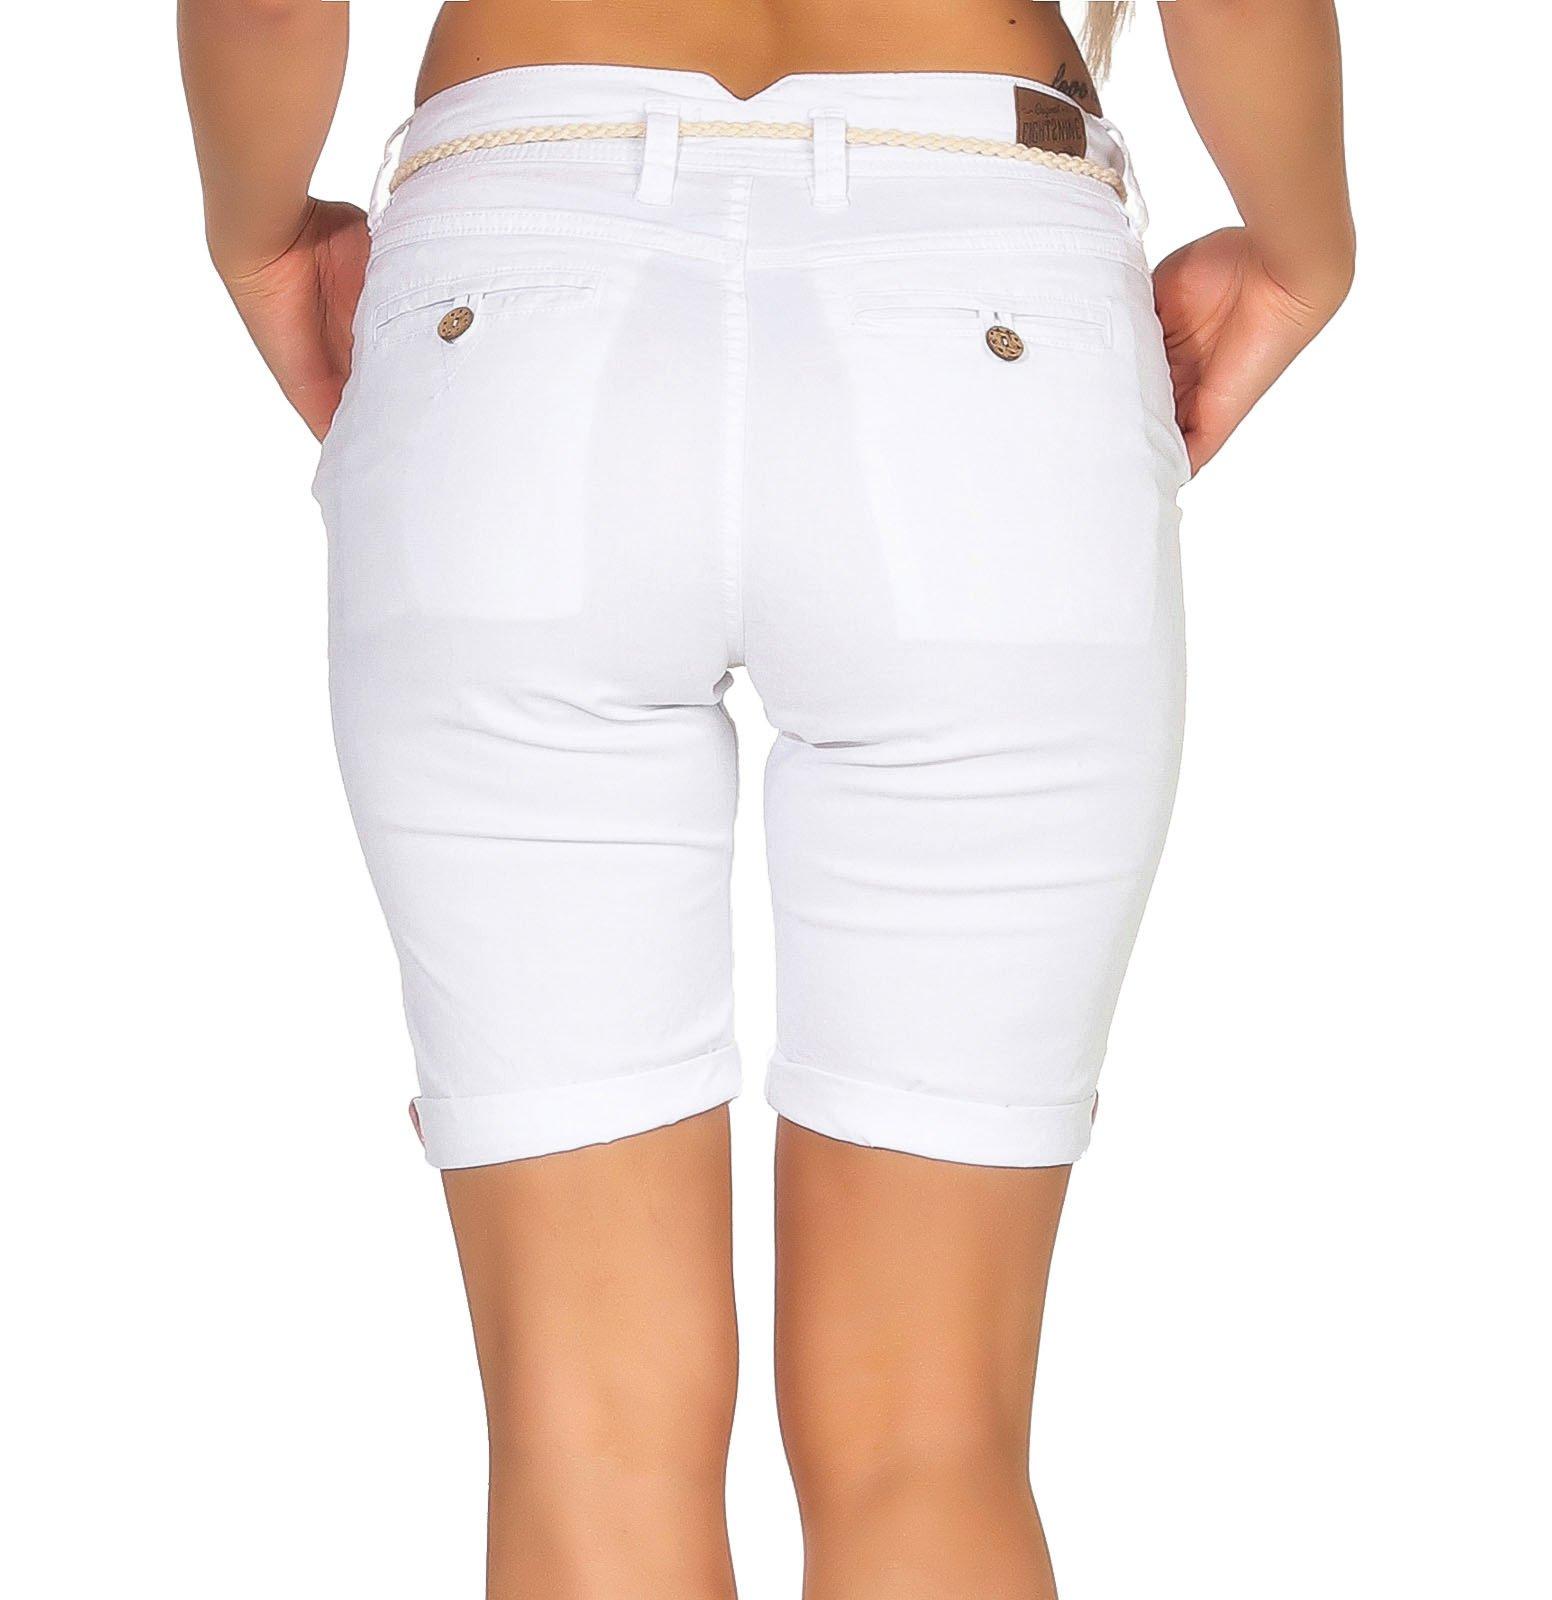 Damen Shorts Damenshorts Damenhose Hose Bermuda Sommershorts Eight2Nine LETN-025